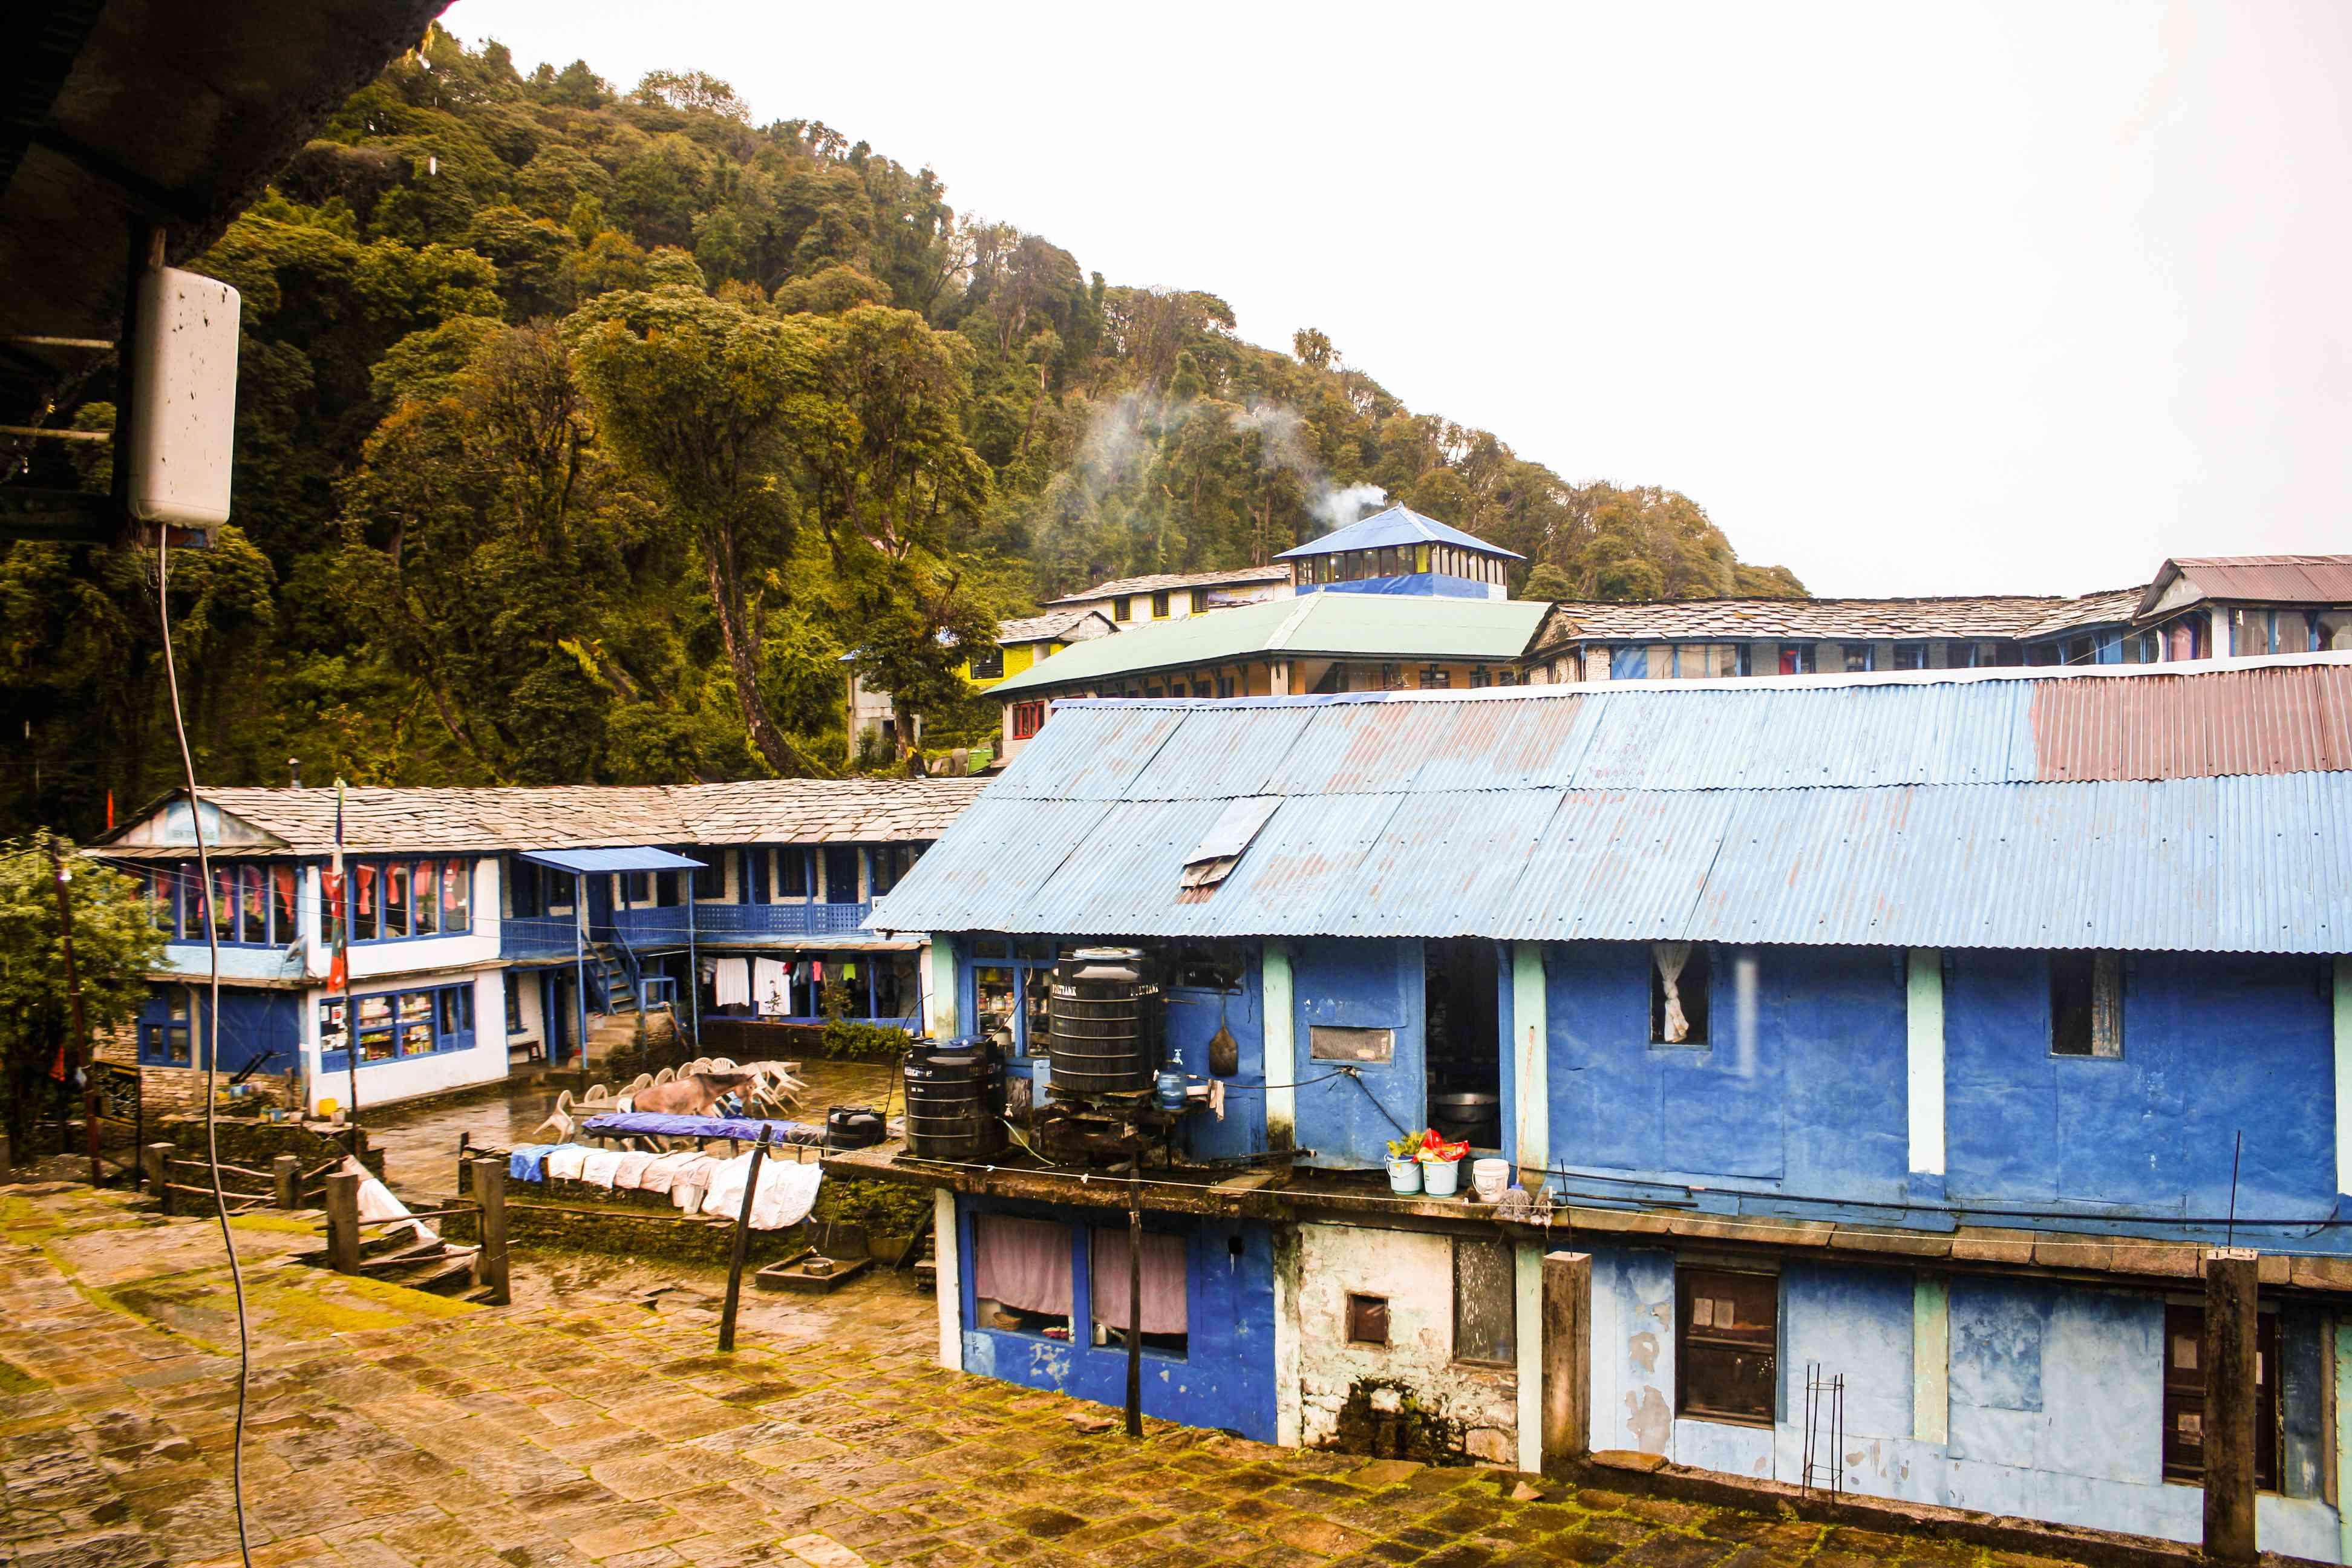 One of the small group of teahouses on the way to Ghorepani Trek and Khopra Trek, Kaski, Nepal.